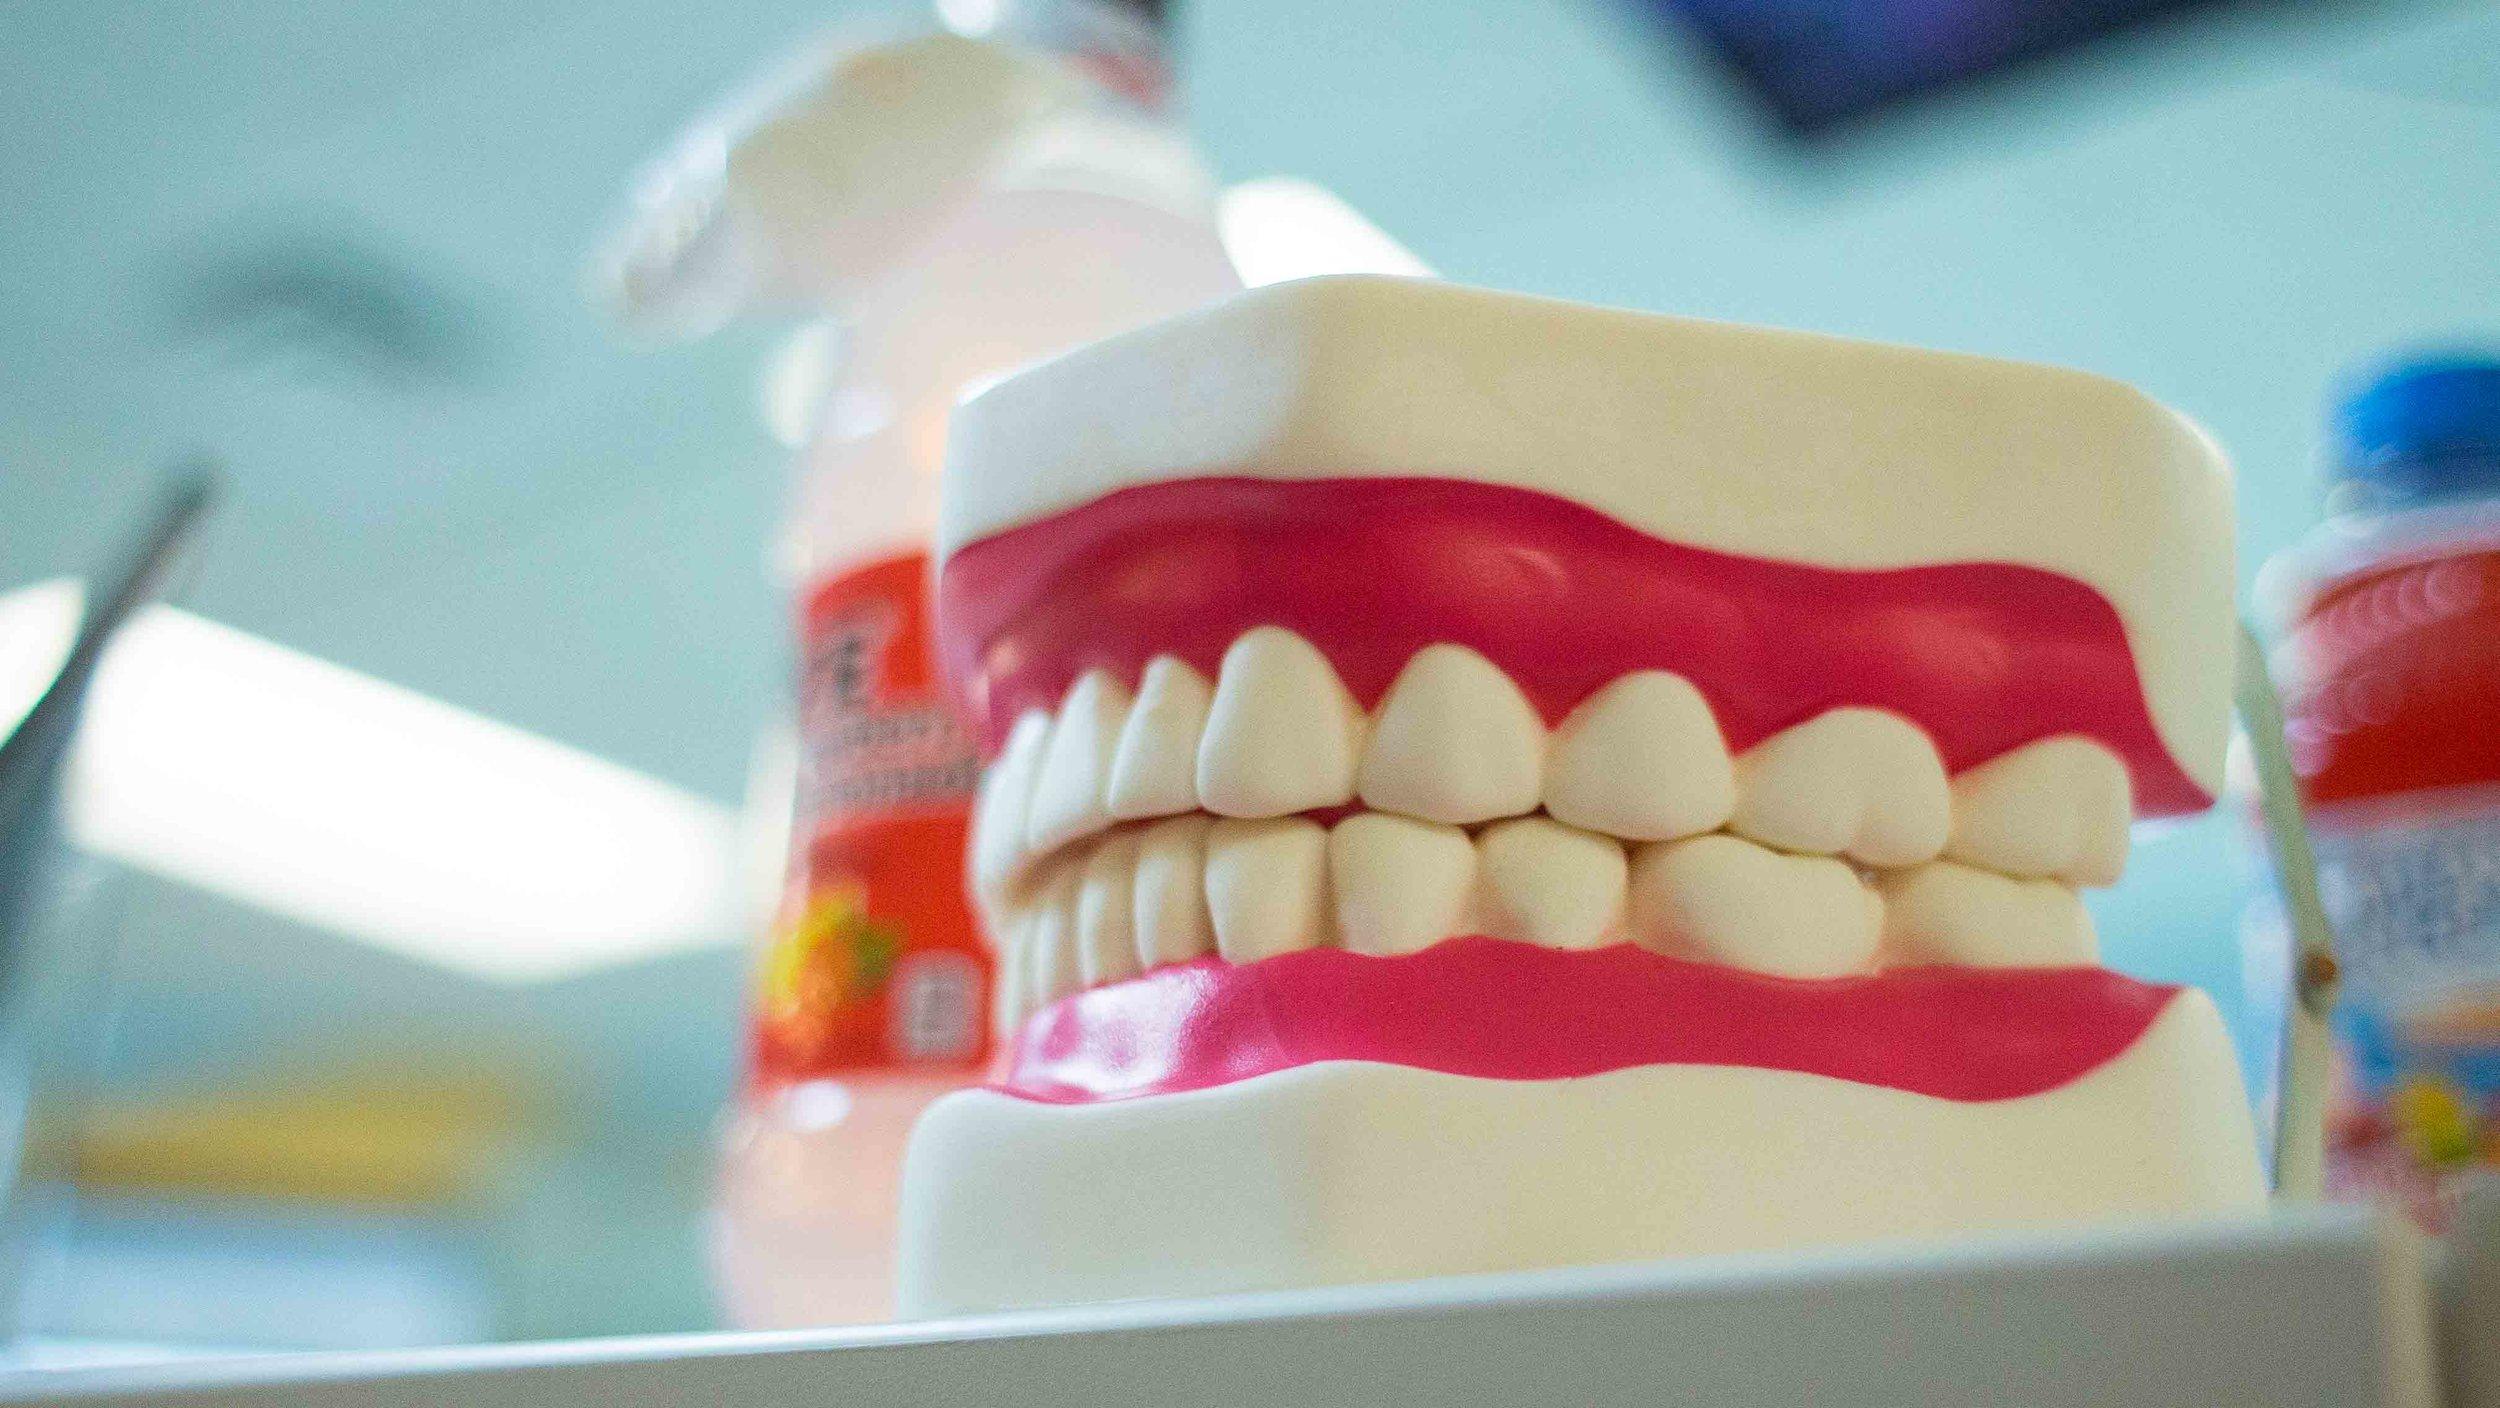 Advanced Pediatric Dentistry Pasco hermiston kids Dentist and orthodontist braces care pediatric children walla walla Tri-cities tricities richmond hermiston pasco Kennewick-65.jpg